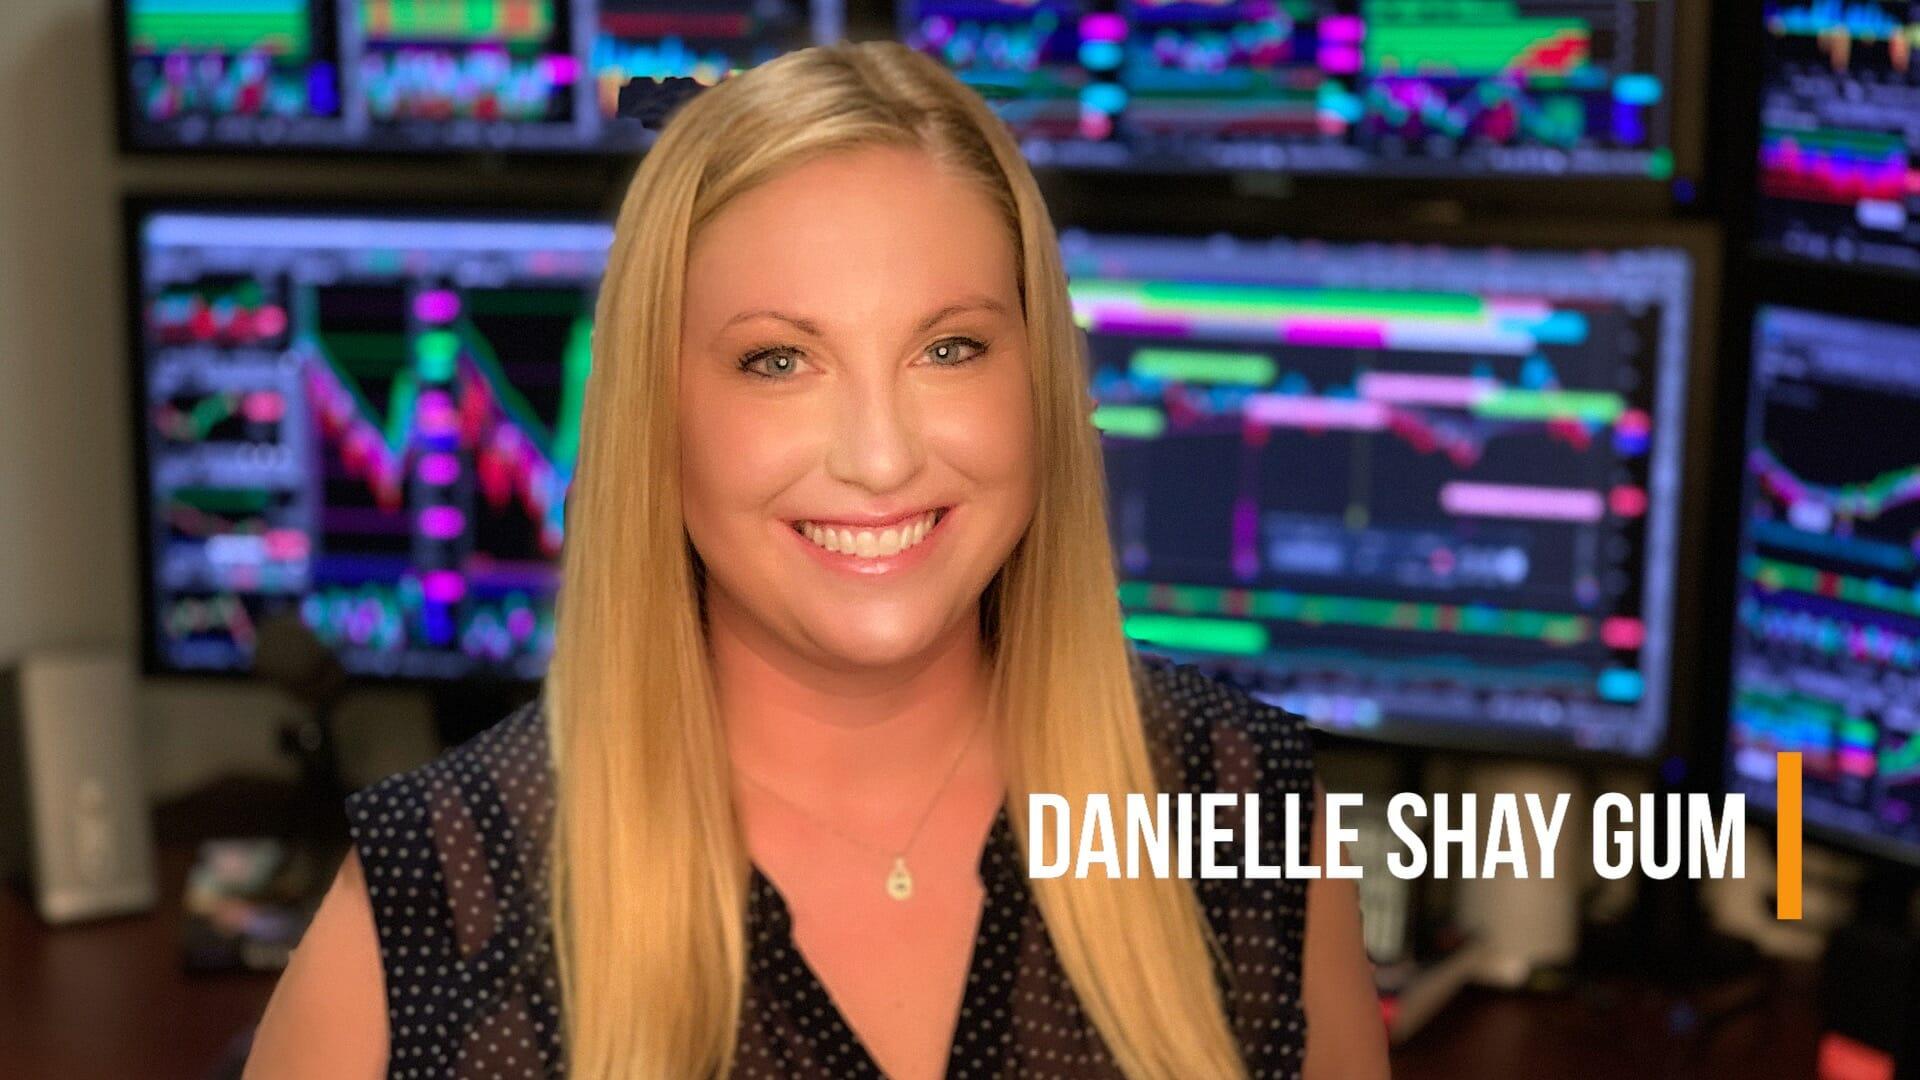 Playbook Danielle